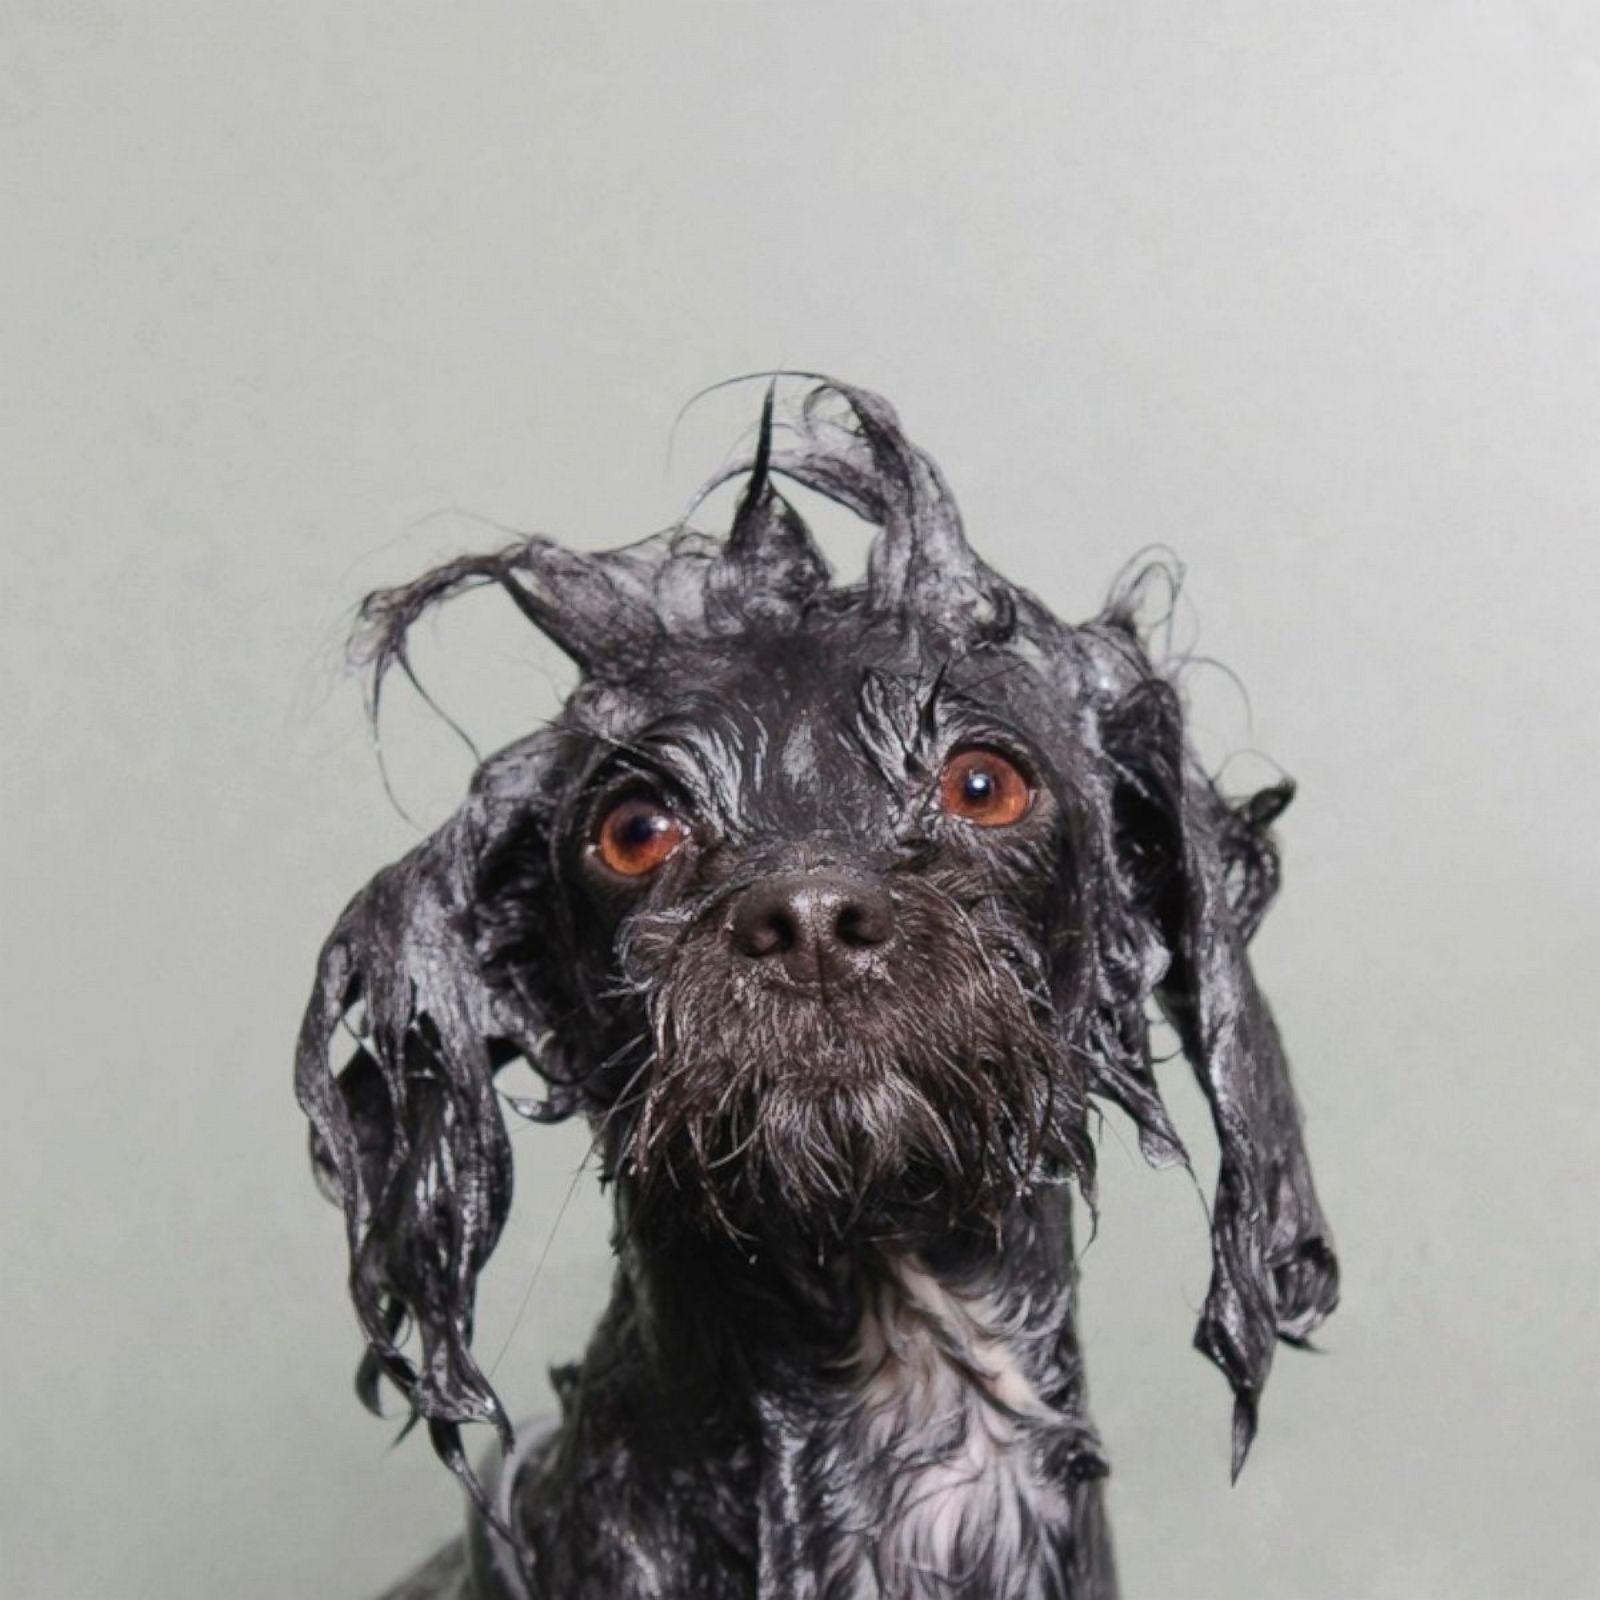 HT_wet_dog1_ml_131126_1x1_1600